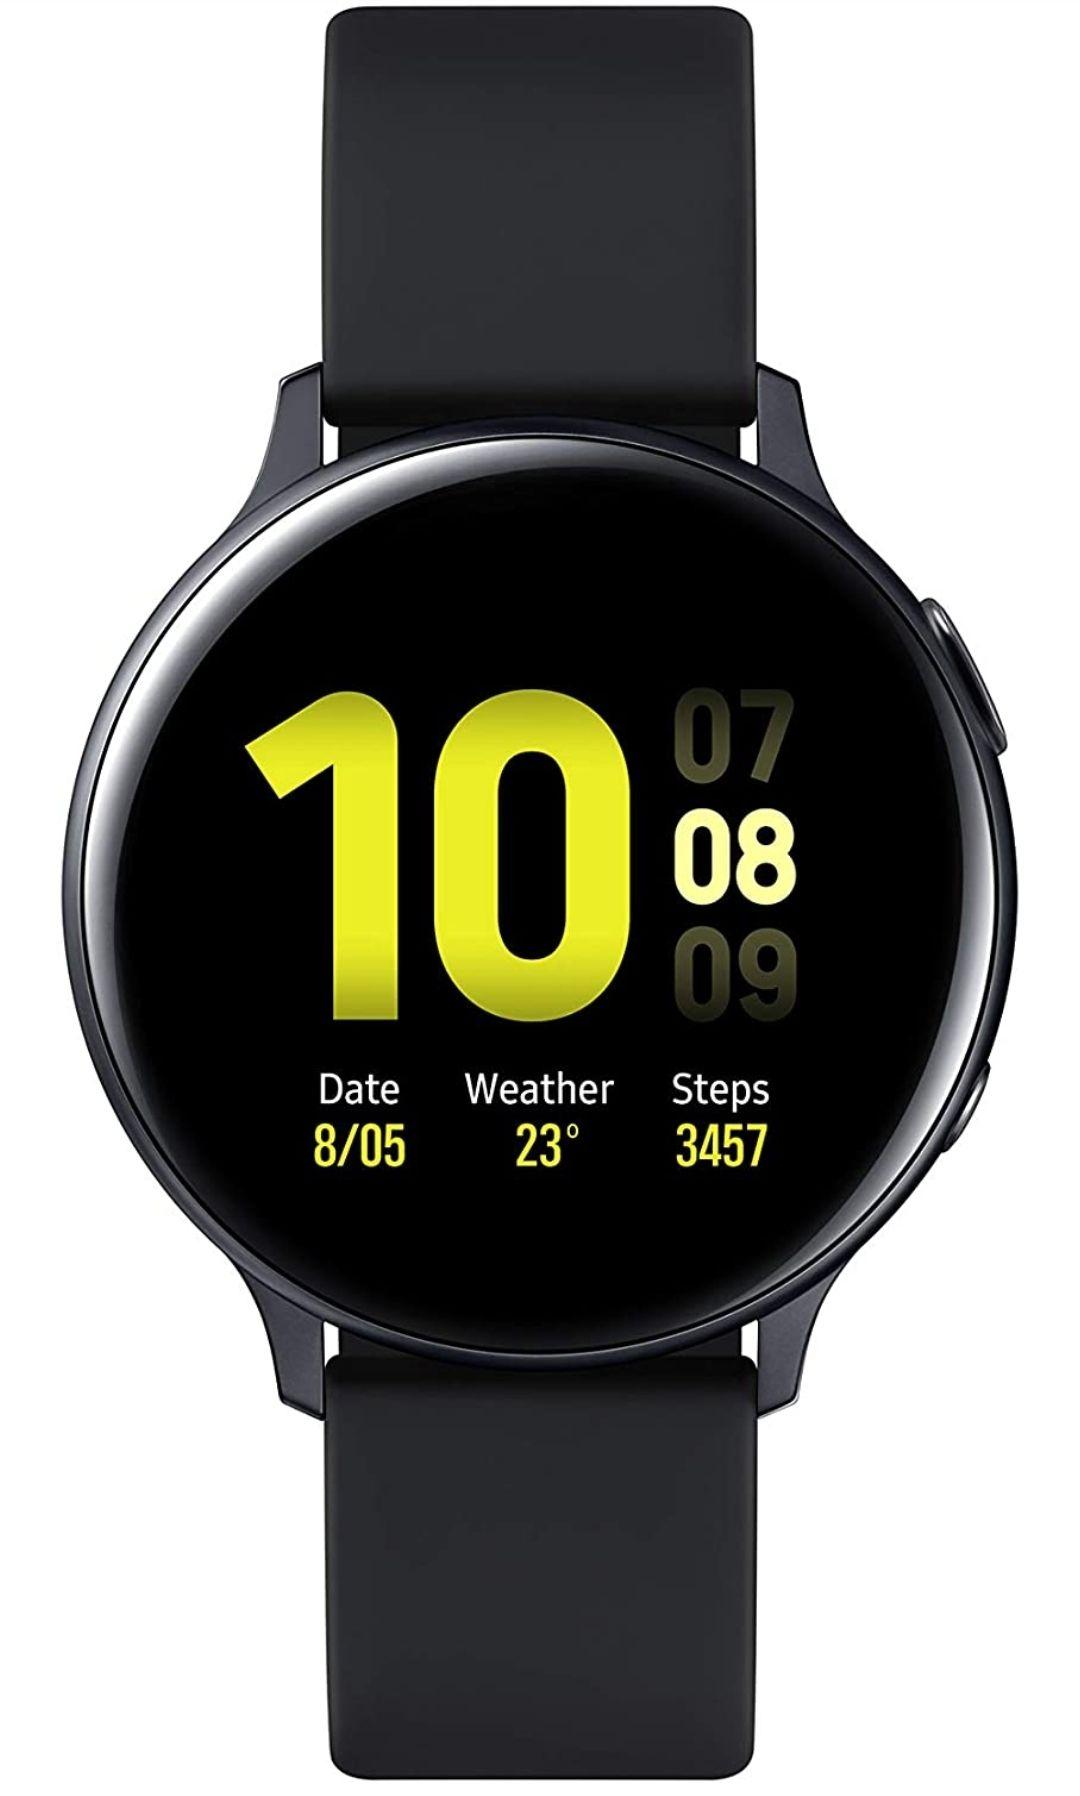 Samsung Galaxy Watch Active2 smartwatch 44mm - Black SAMOLED - £133.62 (UK Mainland Delivery) Sold by Amazon EU @ Amazon